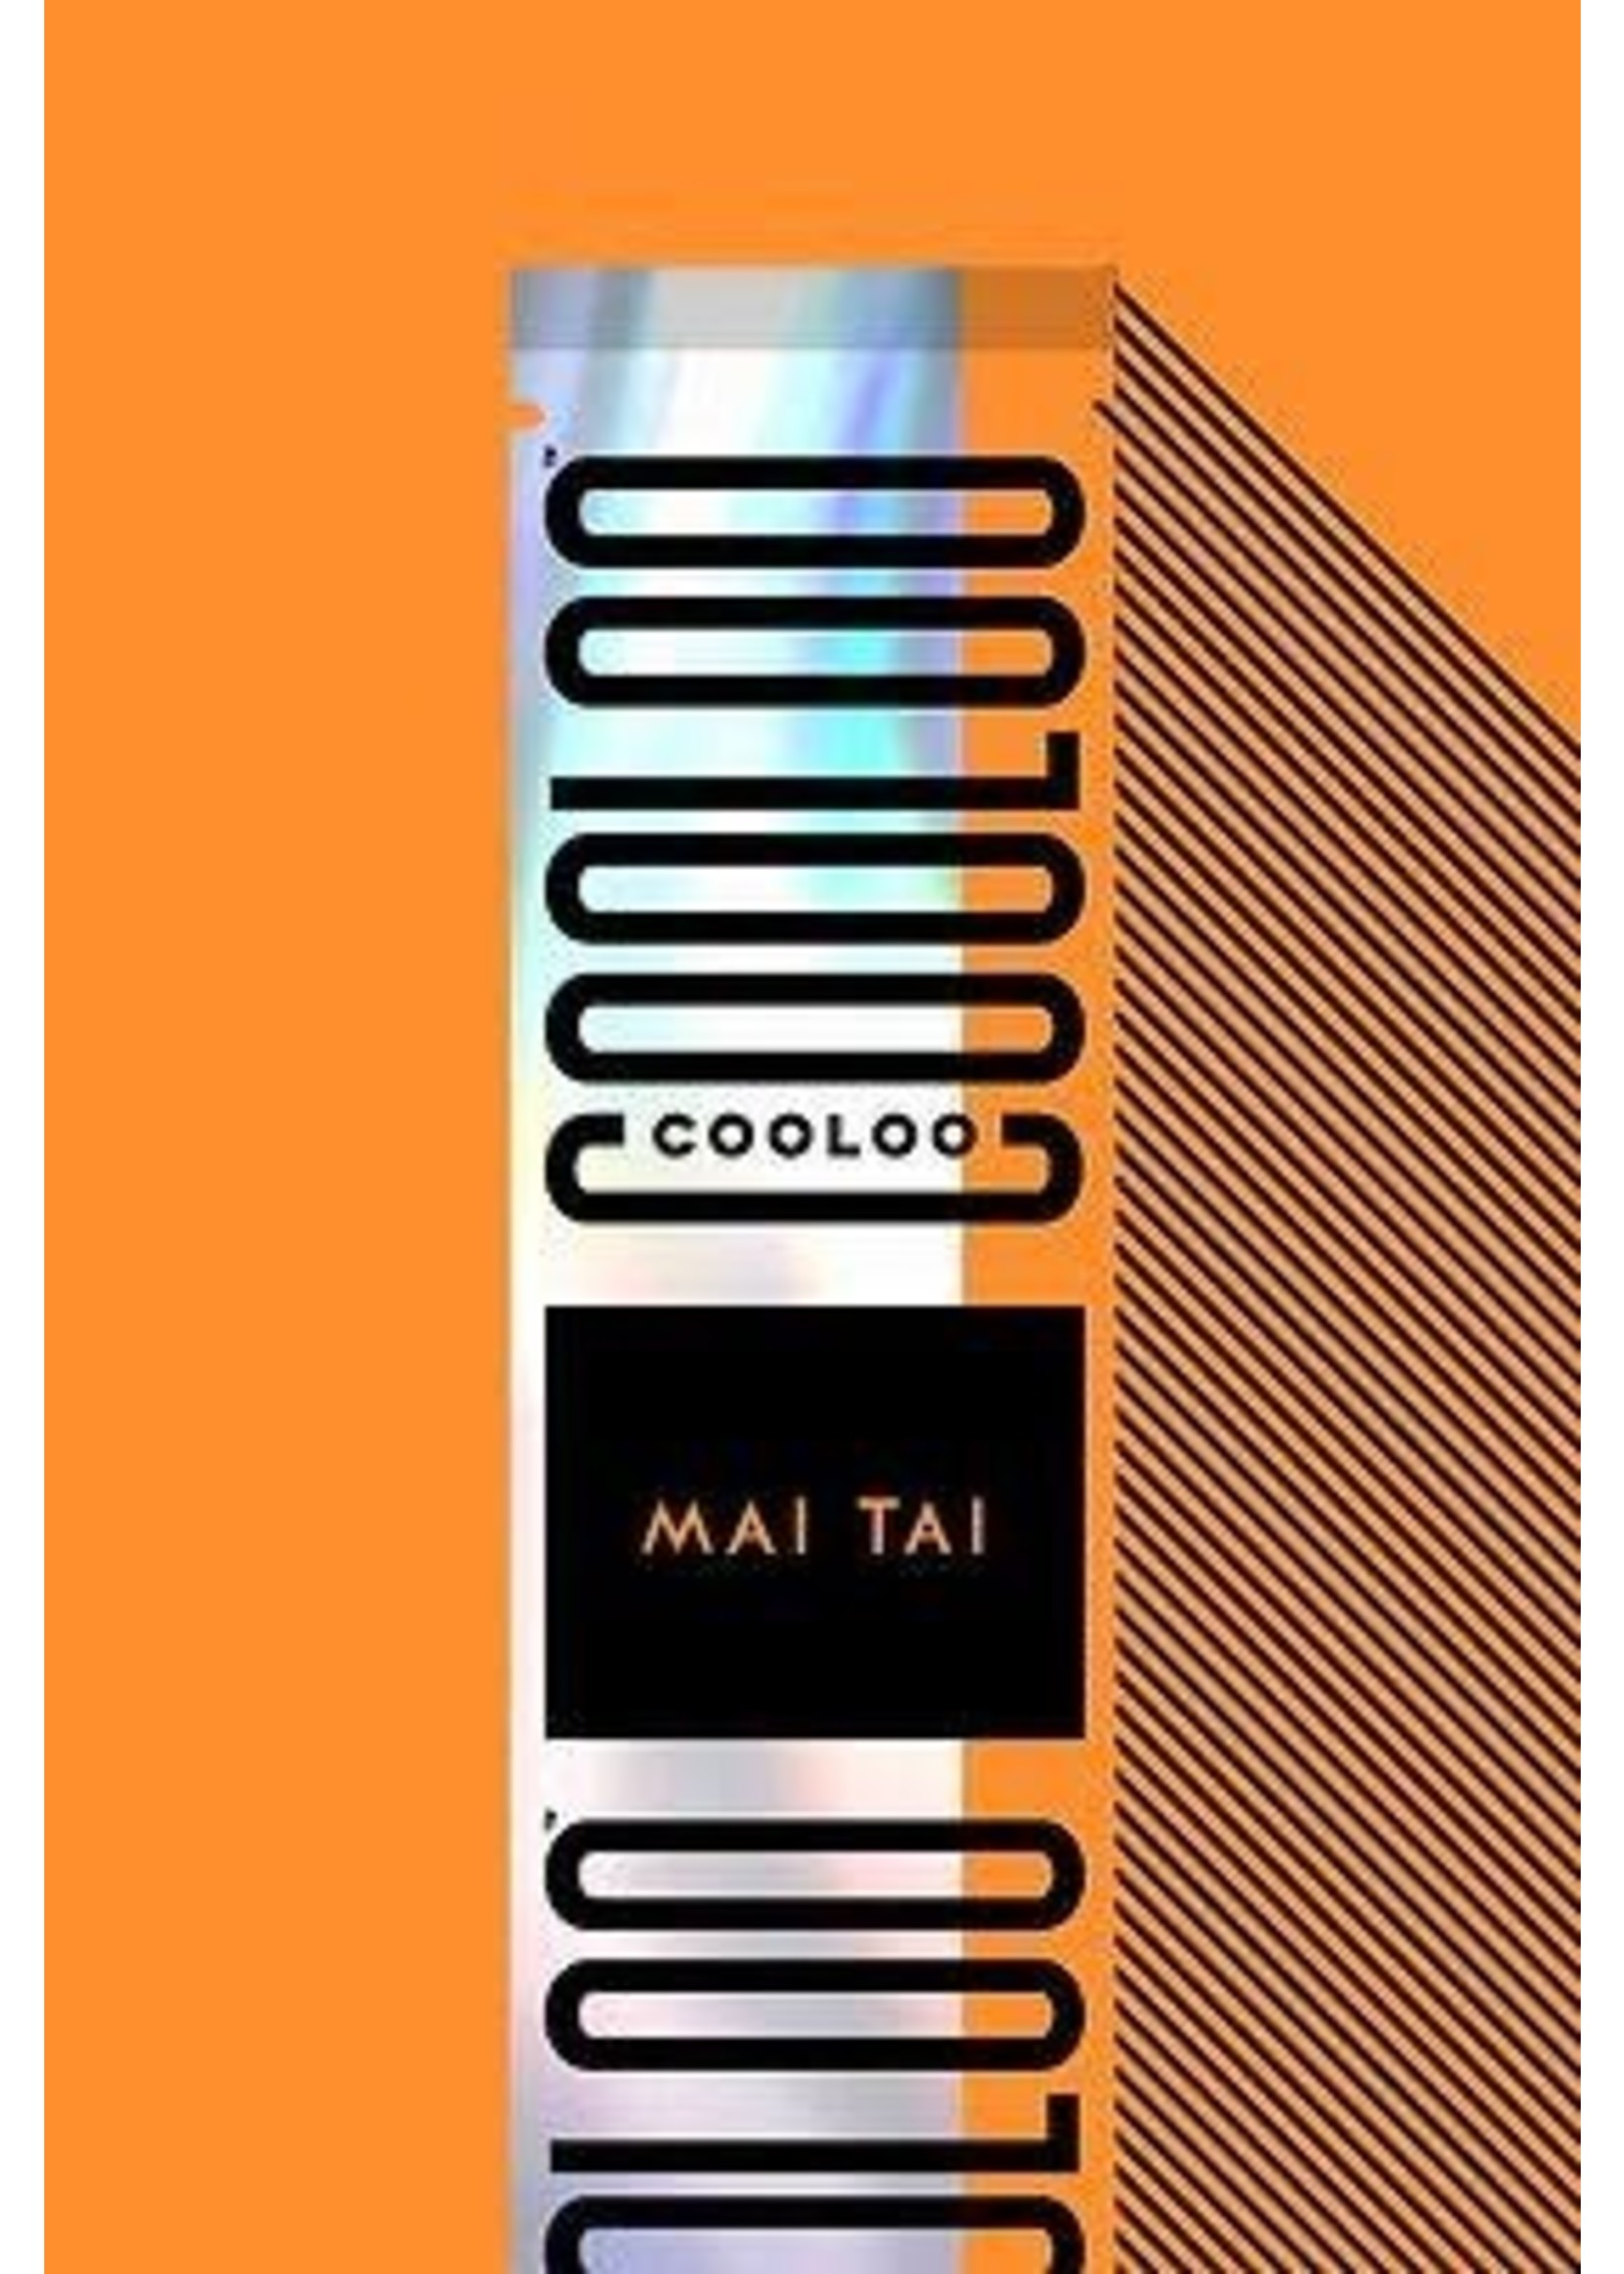 Cooloo Cooloo / Freezepop Mia Tai /100mL